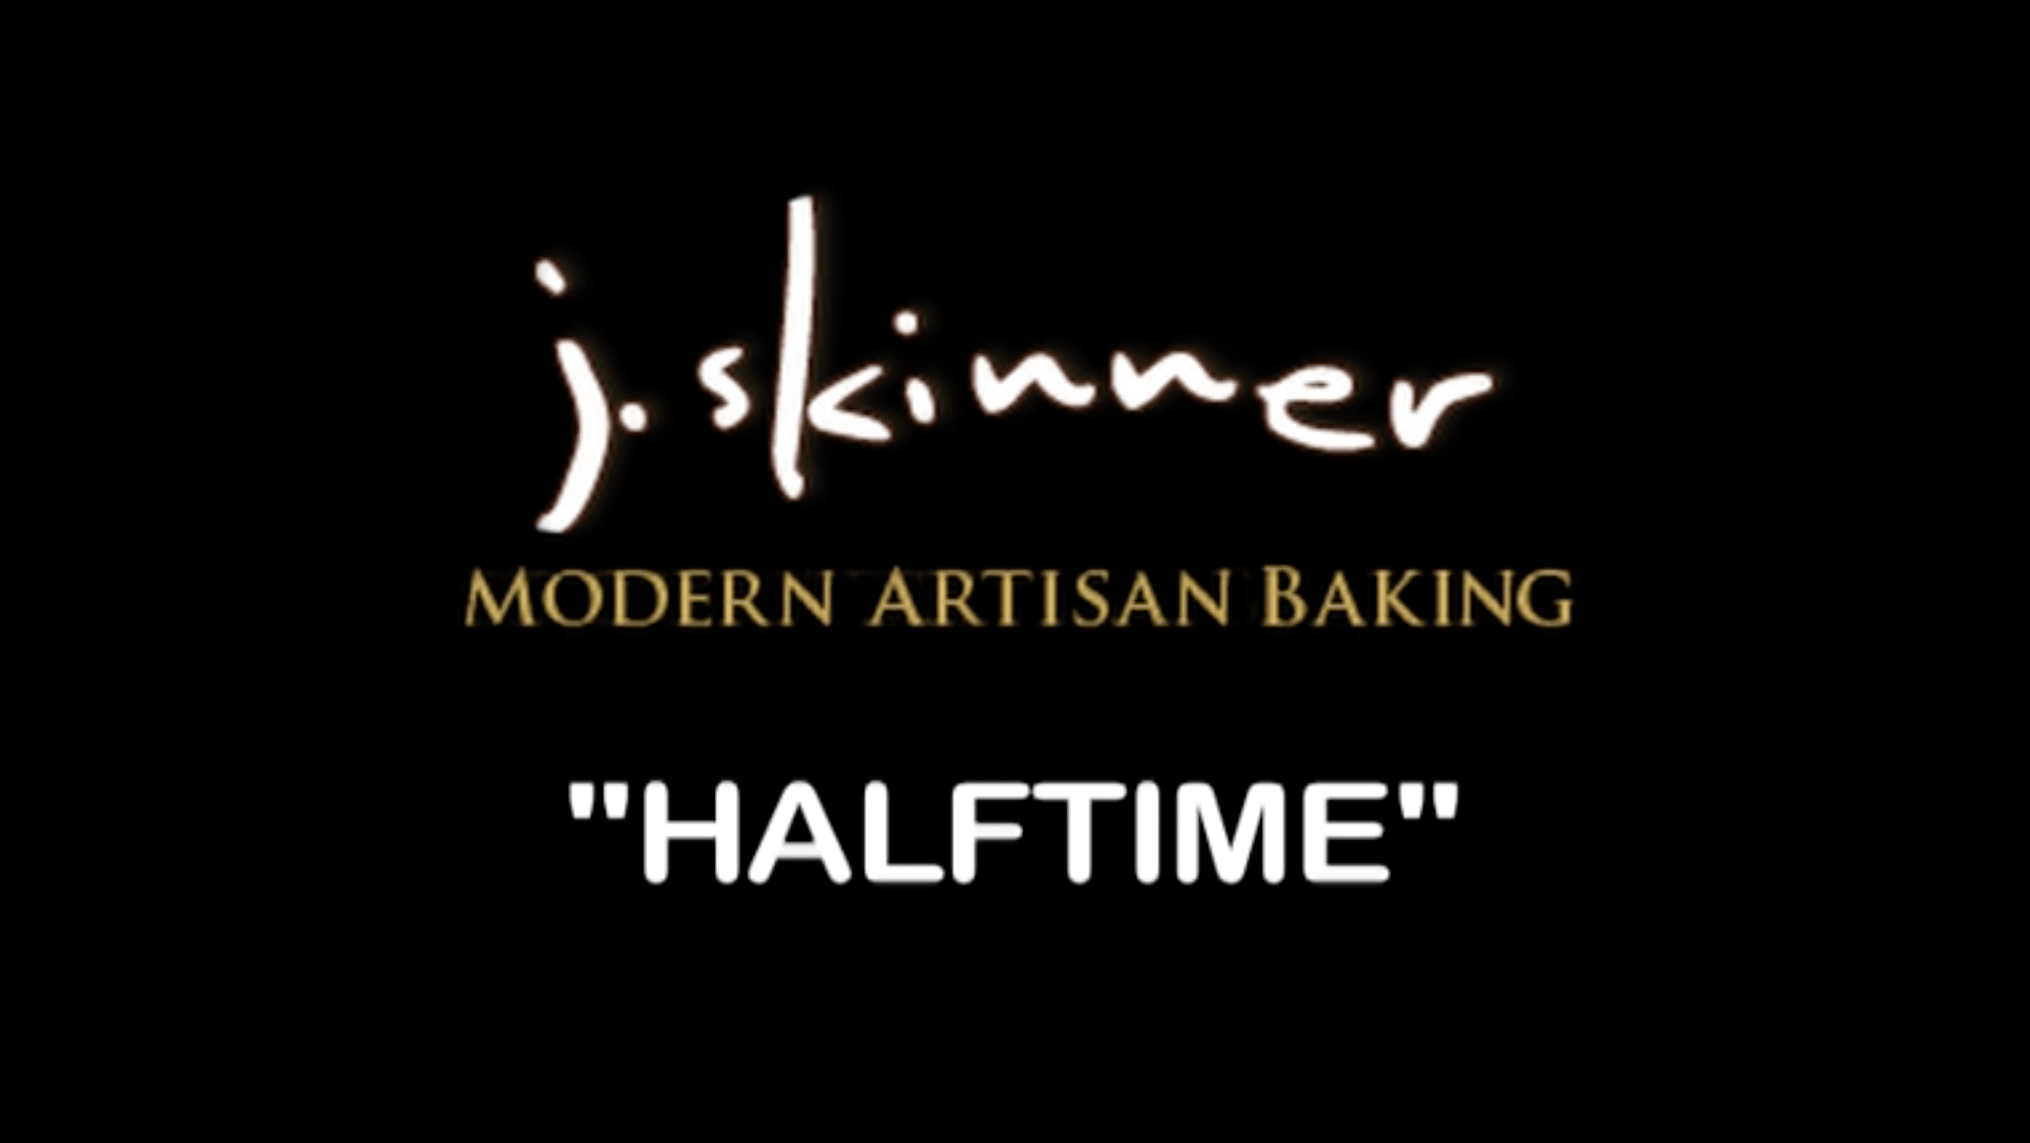 j. skinner Haltime